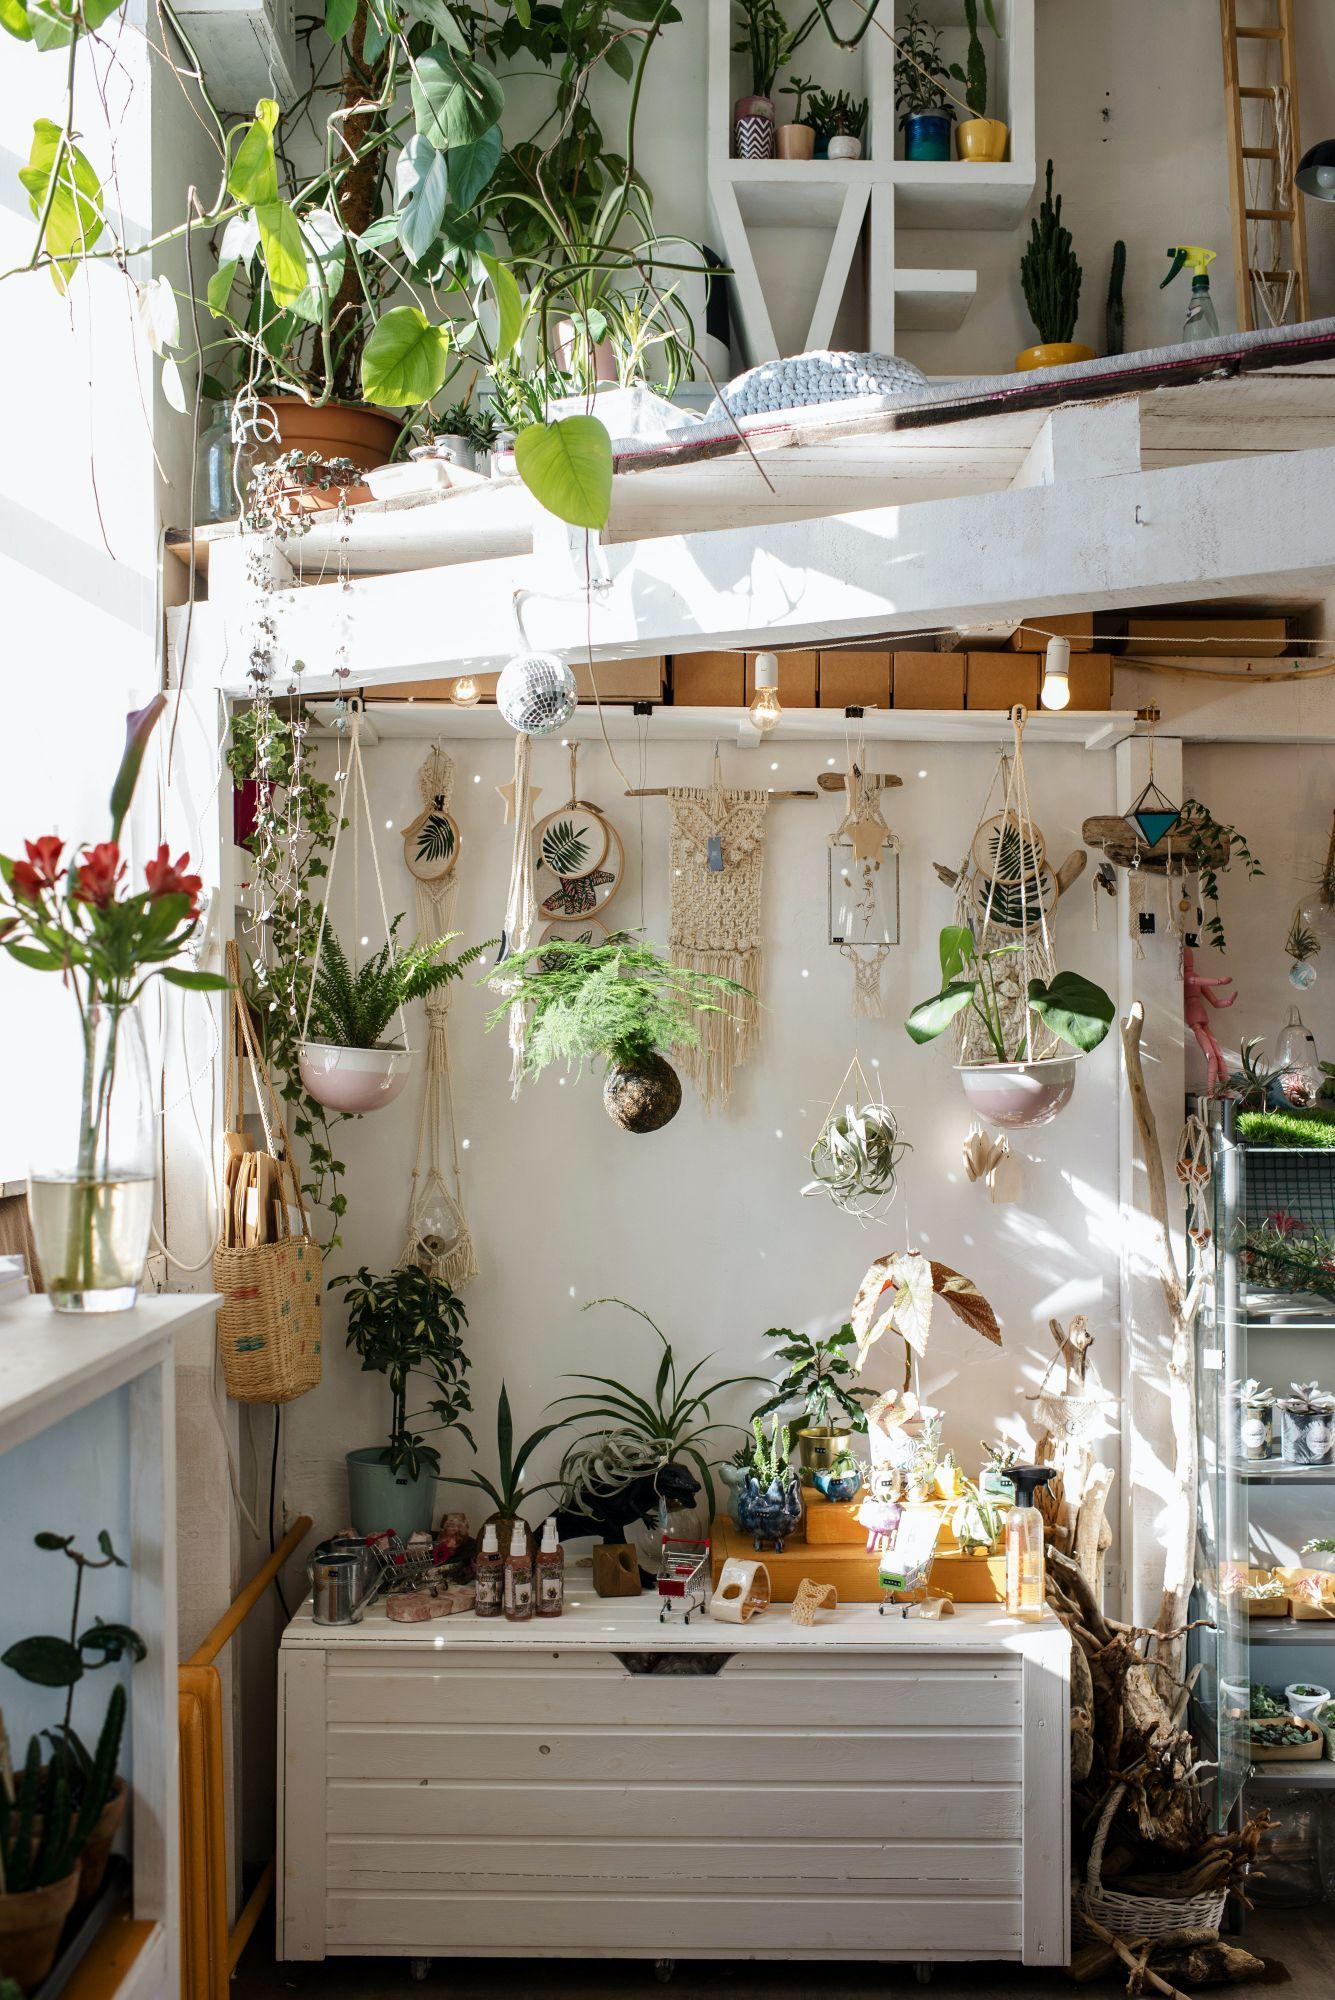 Stile boho jungle: tripudio di piante sempreverdi